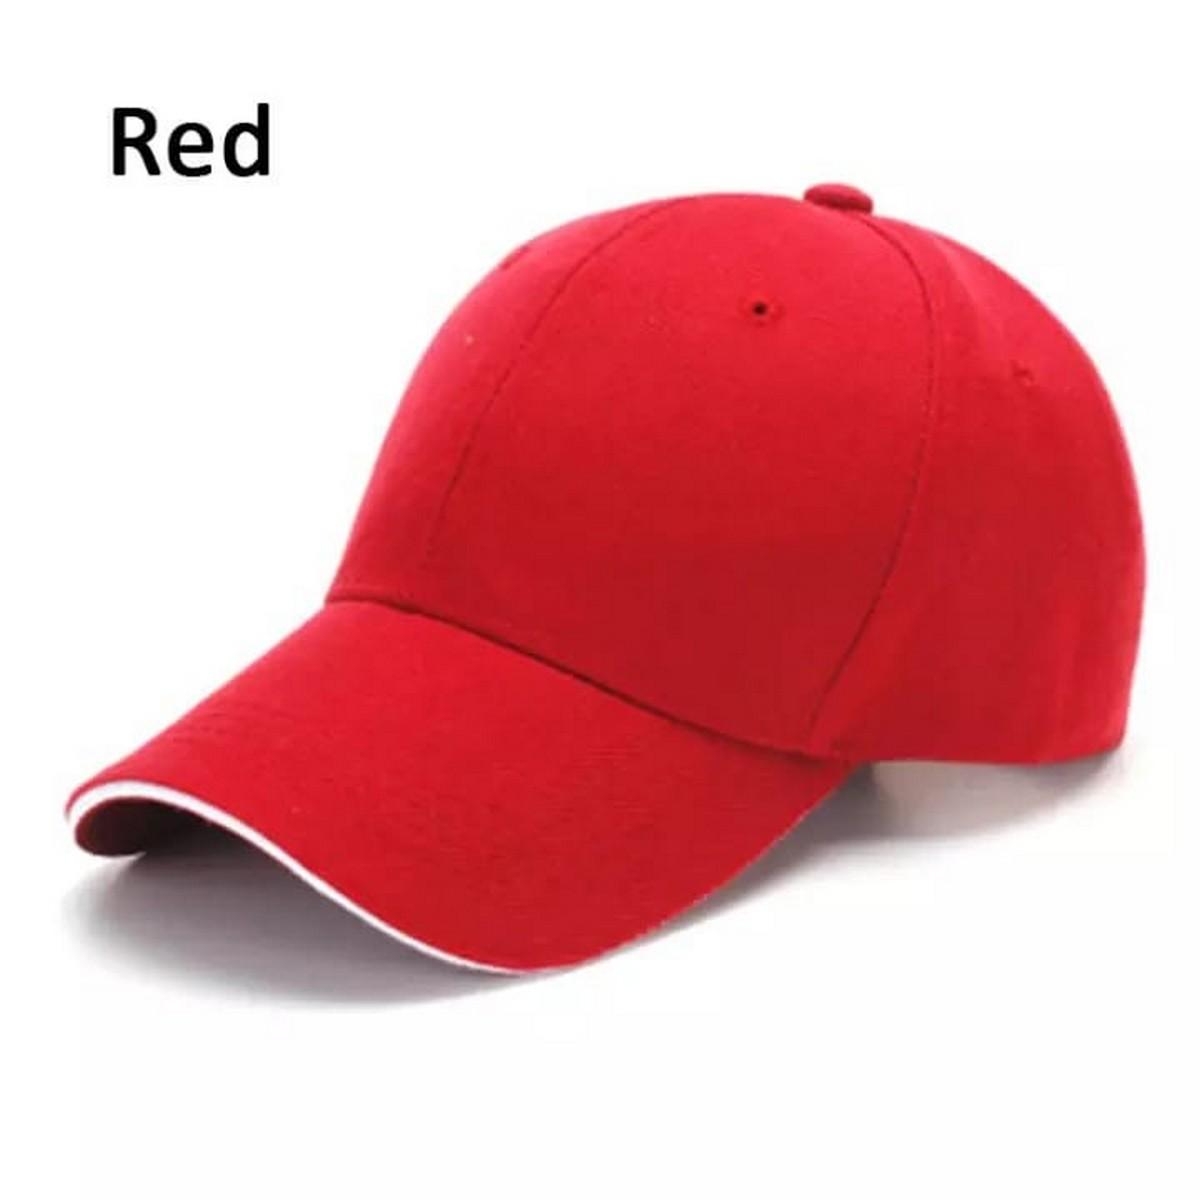 P Cap for Men Baseball Caps Cap with Adjustable Buckle Sun Hat Hats Summer Sports